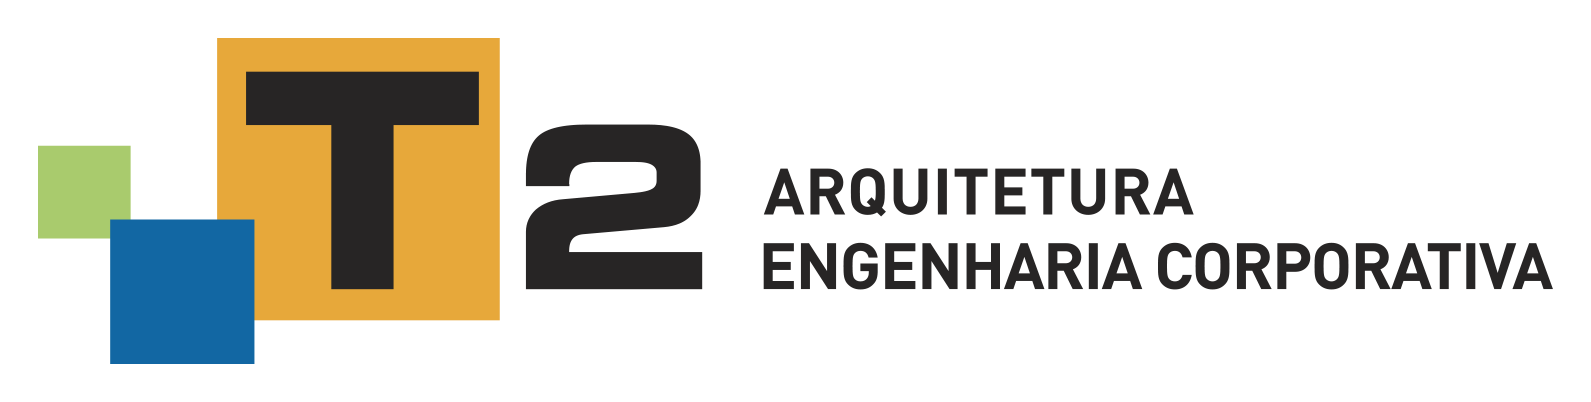 T2 Arquitetura e Engenharia Corporativa